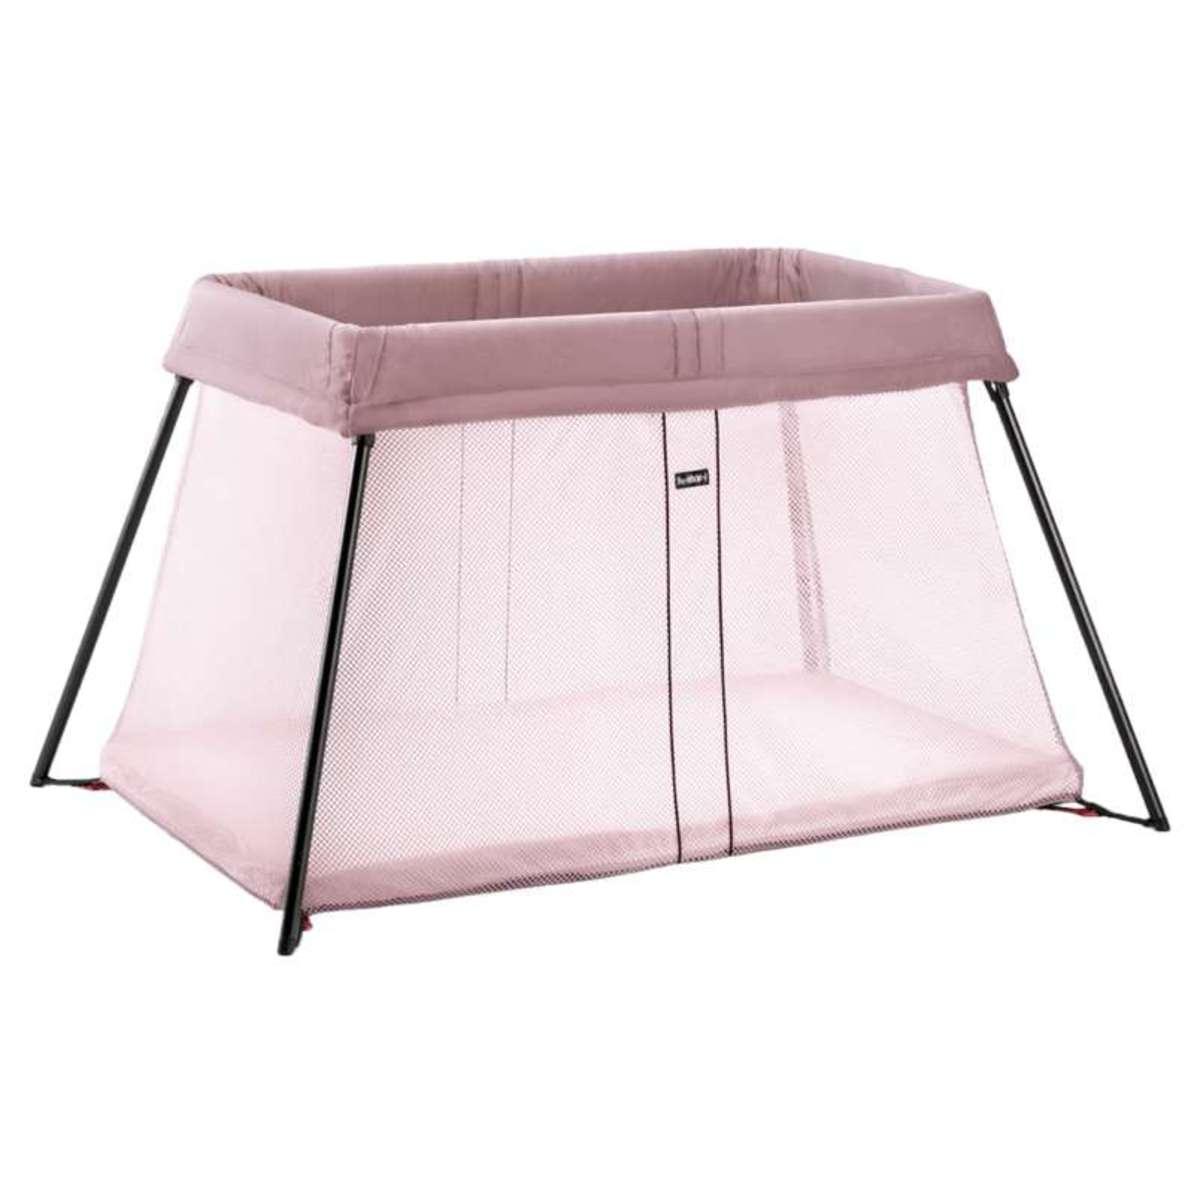 babybjorn lit parapluie de voyage light rose. Black Bedroom Furniture Sets. Home Design Ideas